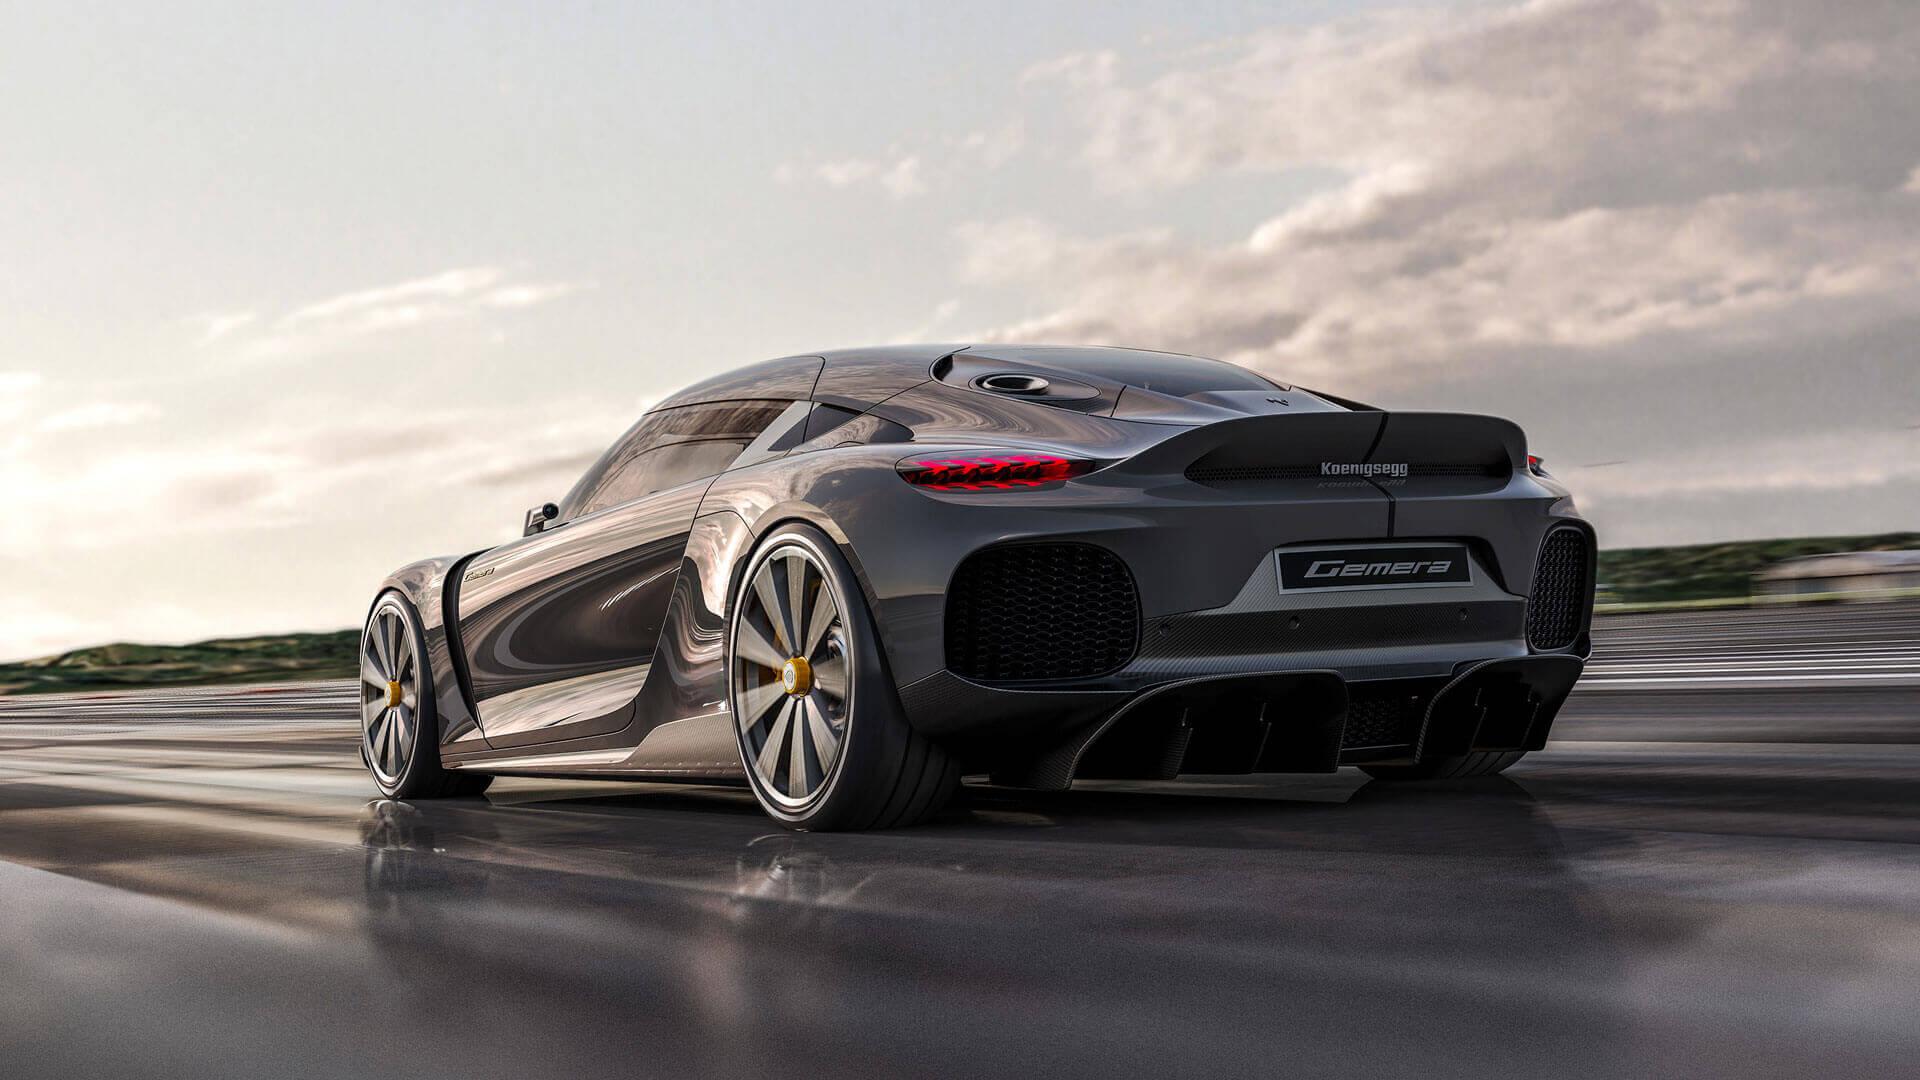 Гибридный гиперкар Koenigsegg Gemera мощностью 1,27 МВт